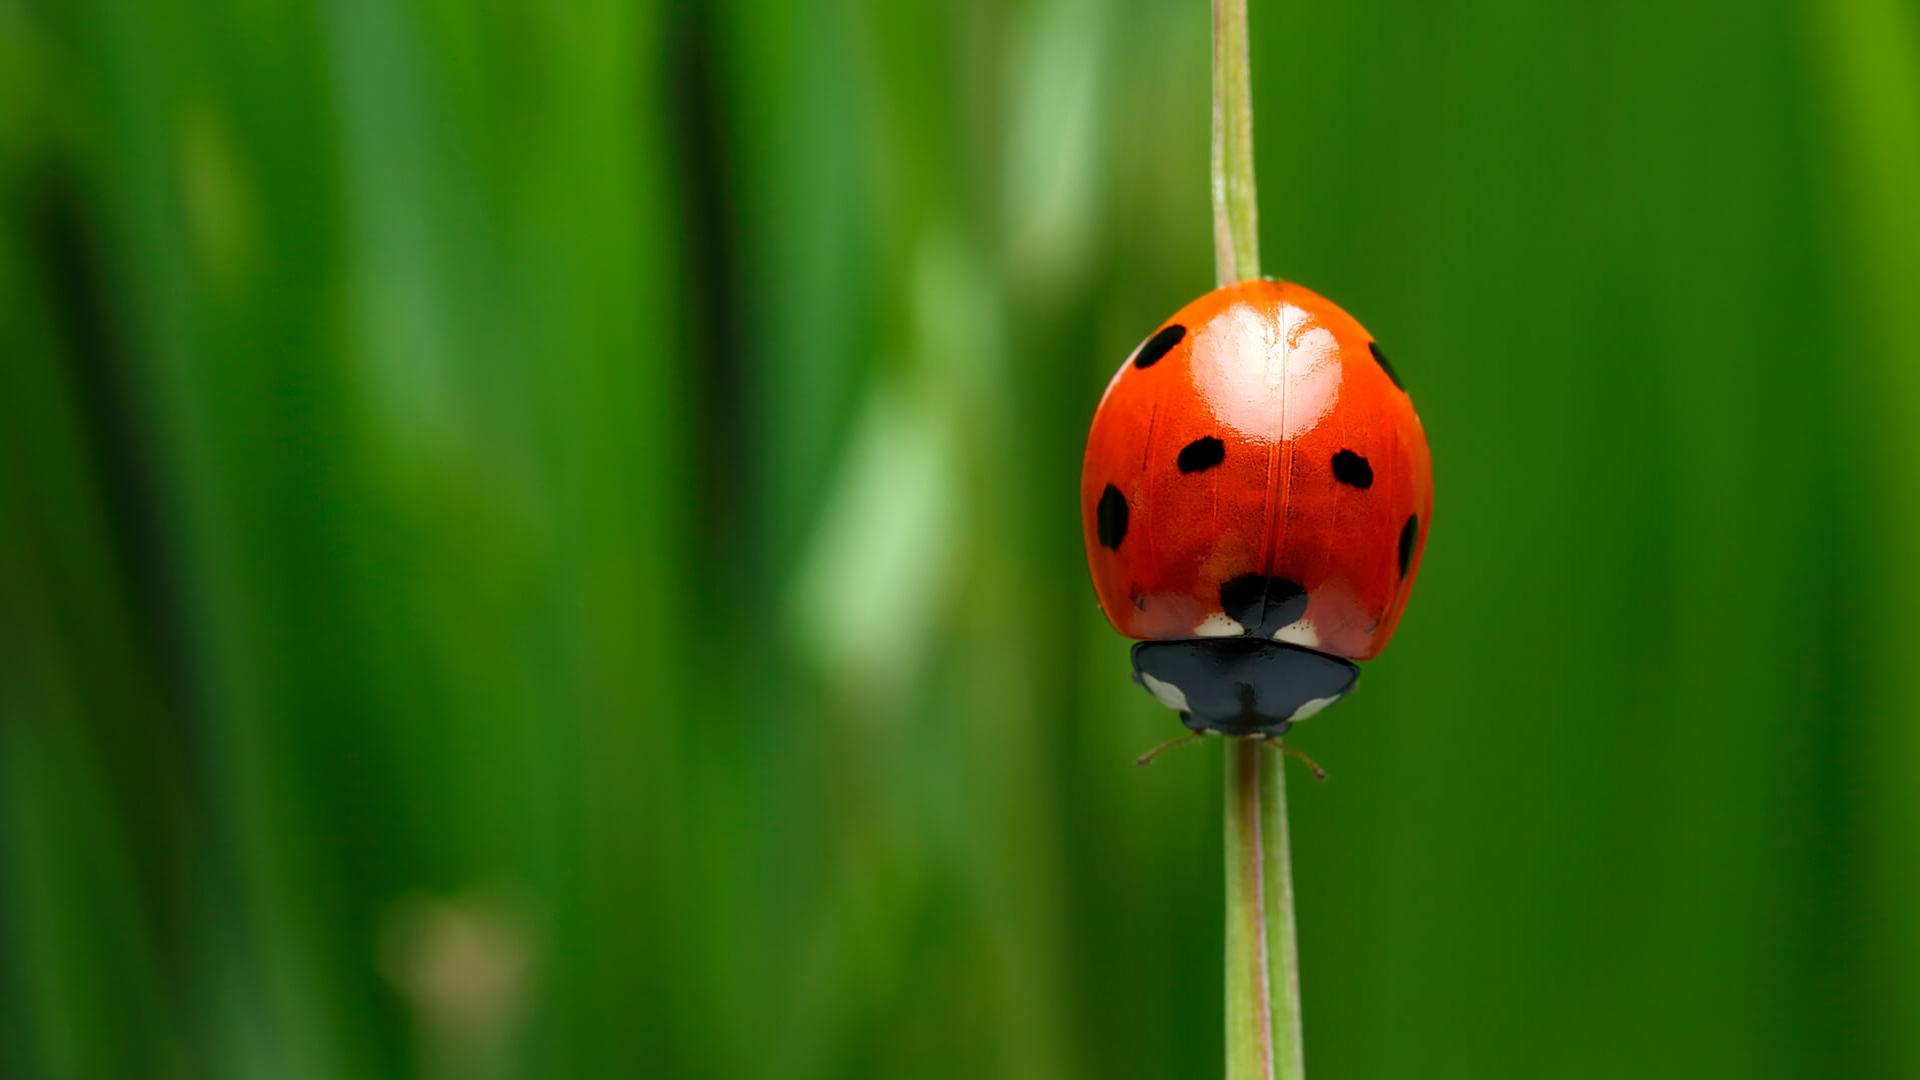 Cute Animal Iphone Wallpaper Ladybug San Diego Zoo Animals Amp Plants